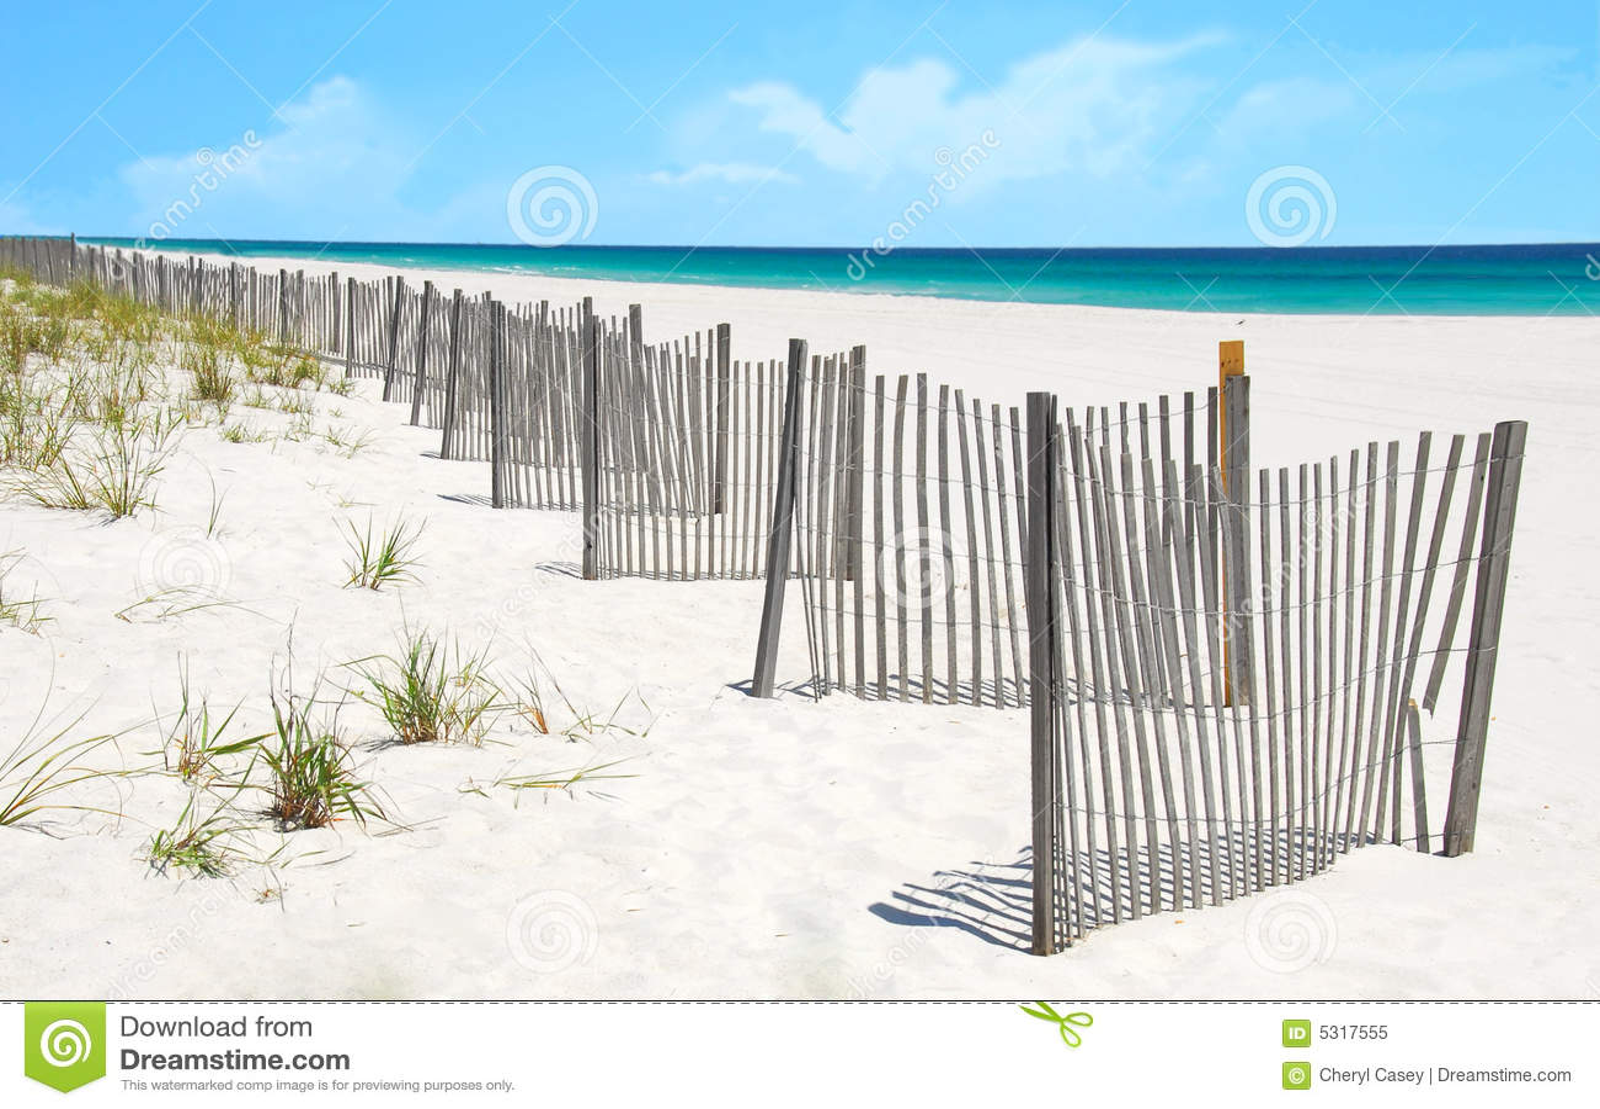 Sand Dune Fence On Pretty Beach Royalty Free Stock Photo